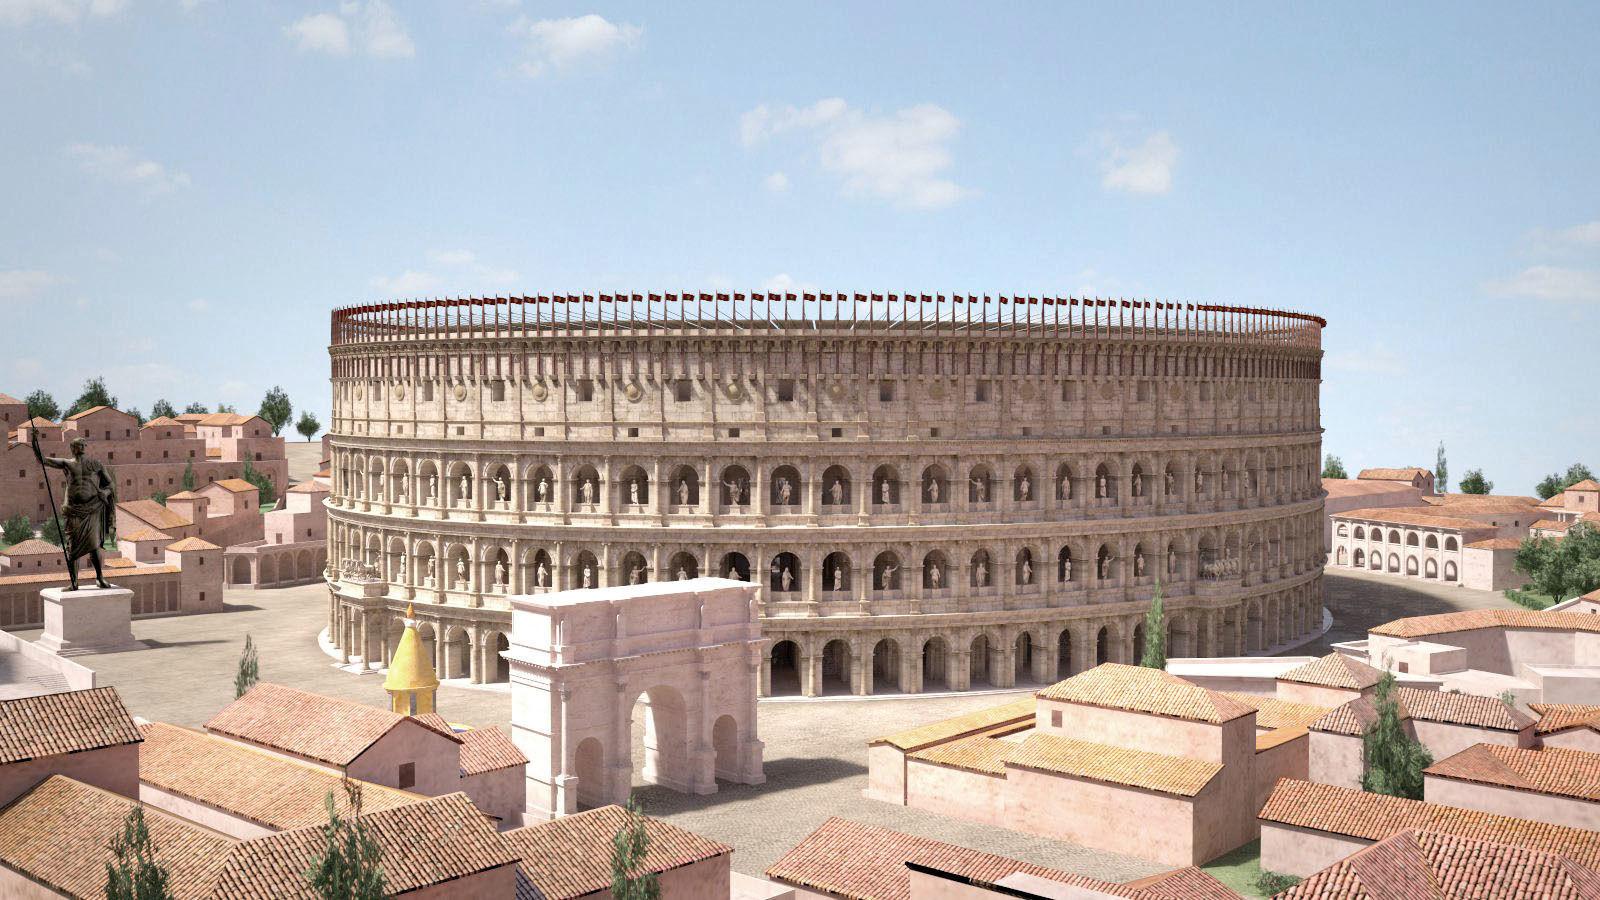 Roman Colosseum High detailed